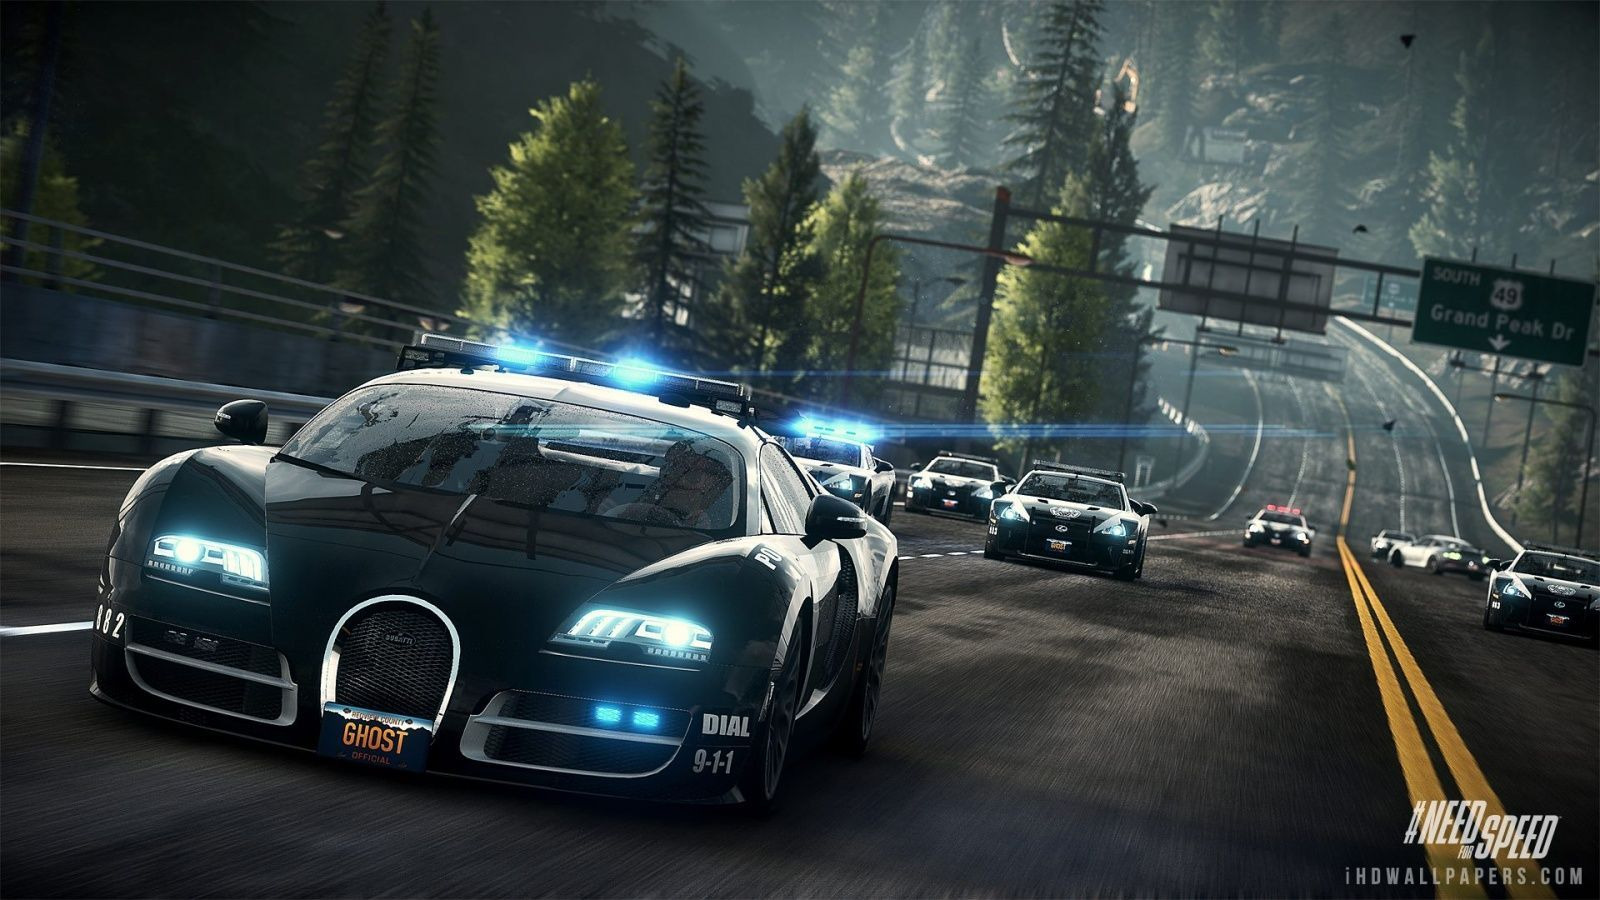 Gta 5 Car Wallpapers Photo Sdeerwallpaper Need For Speed Rivals Need For Speed Need For Speed Movie